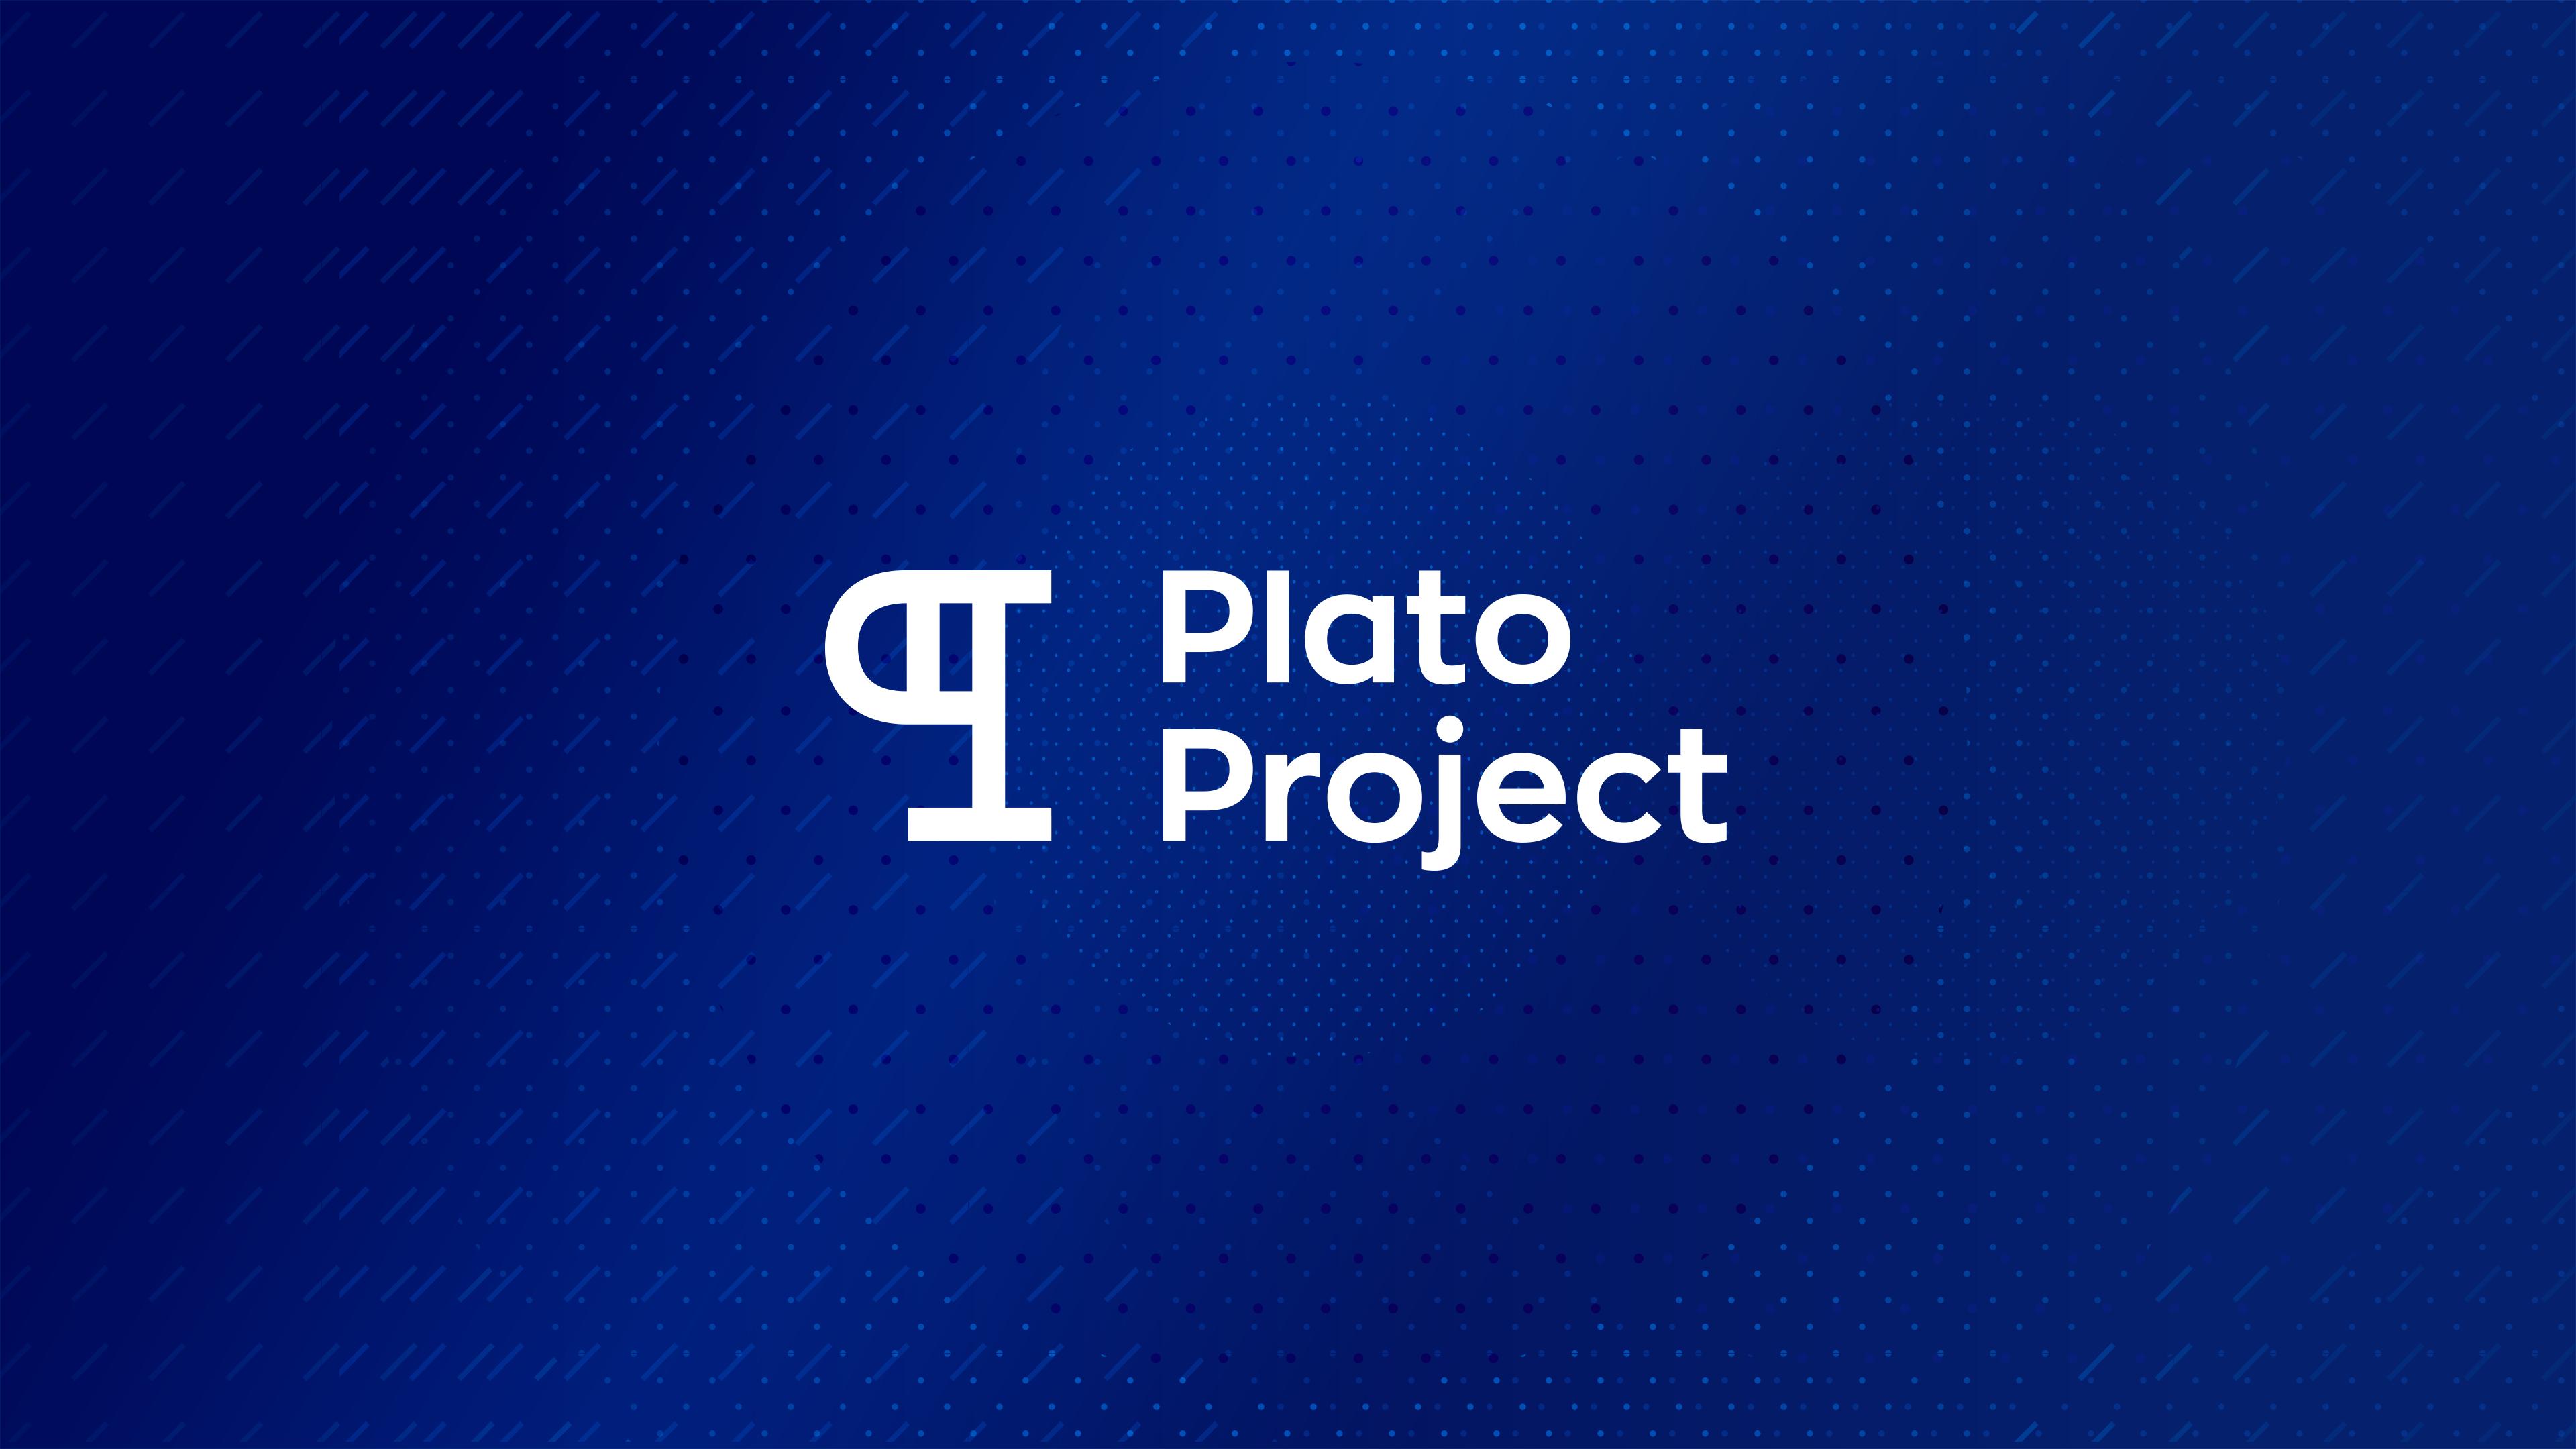 Plato Project Brandmark designed by Helium design Melbourne